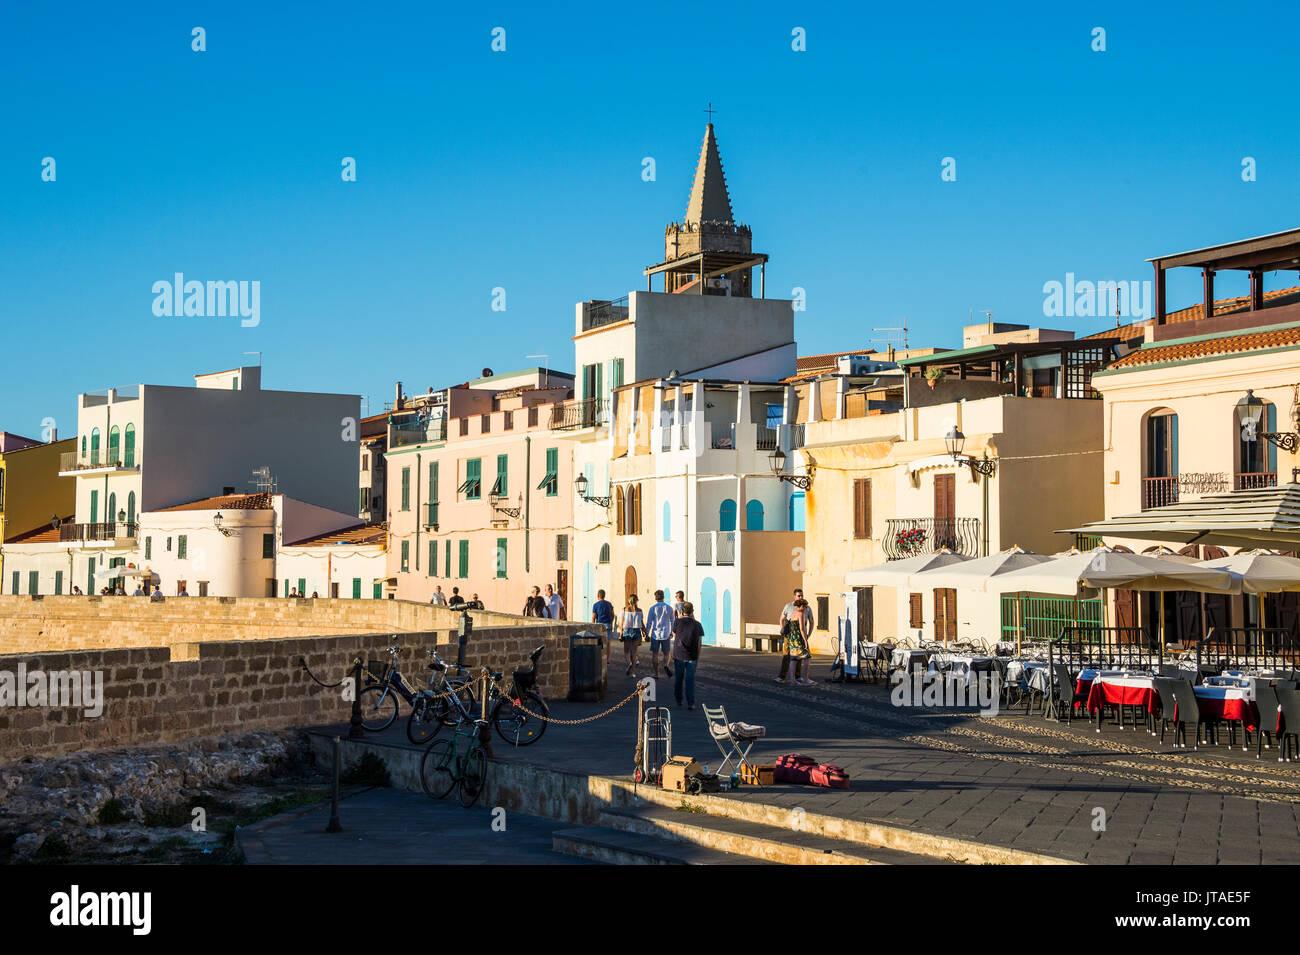 Promenade de l'océan dans la ville côtière de Alghero, Sardaigne, Italie, Méditerranée, Europe Photo Stock